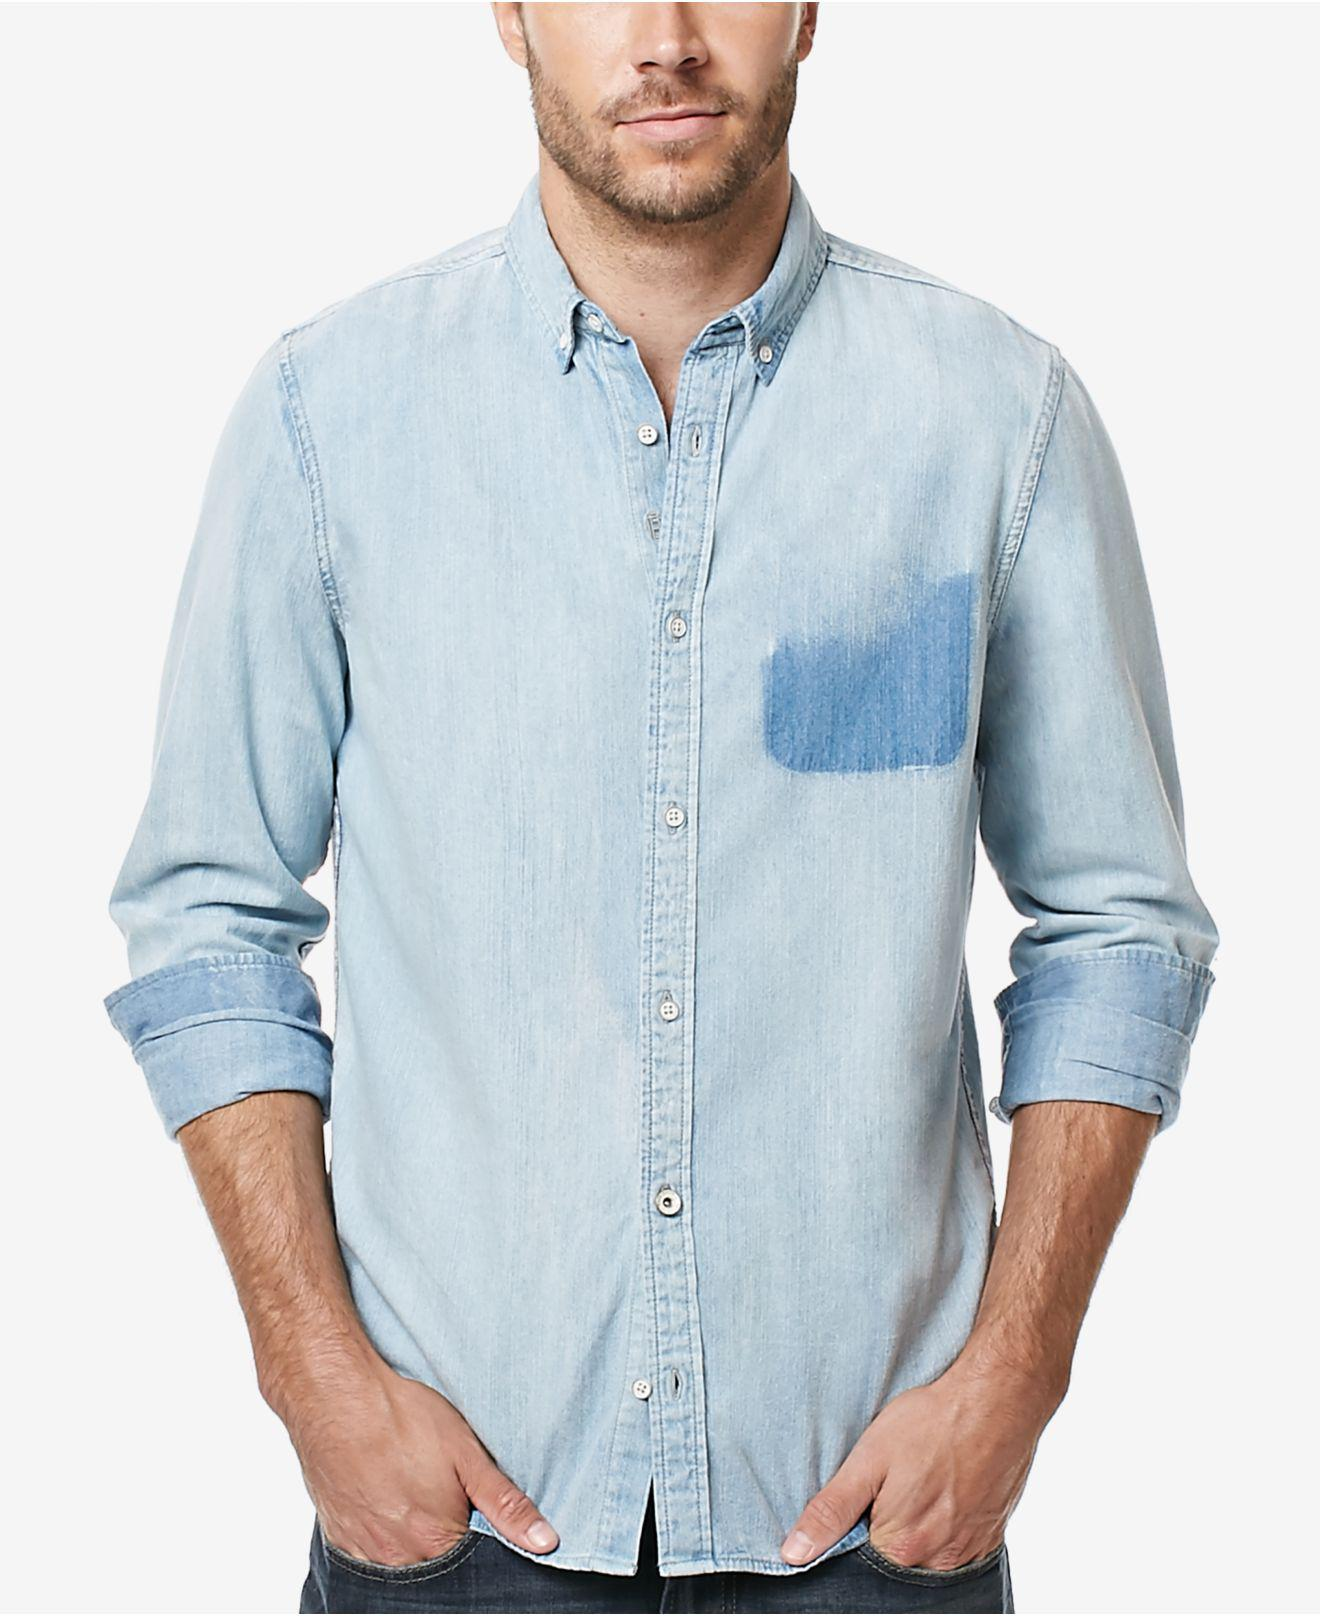 f9e53fea55 Lyst - Buffalo David Bitton Men s Sigmun Denim Shirt in Blue for Men